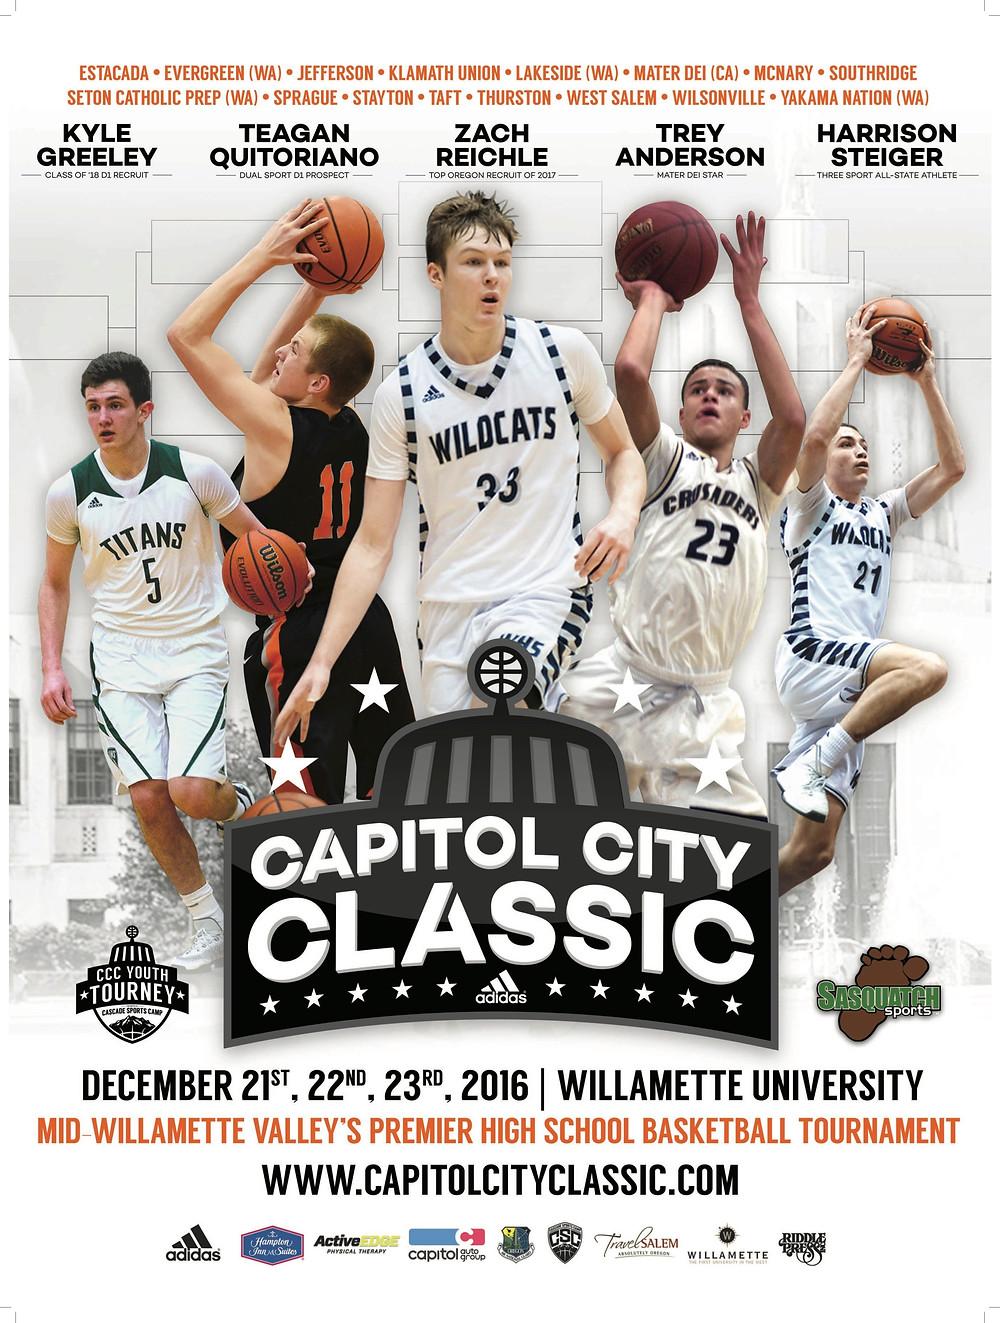 Capitol City Classic